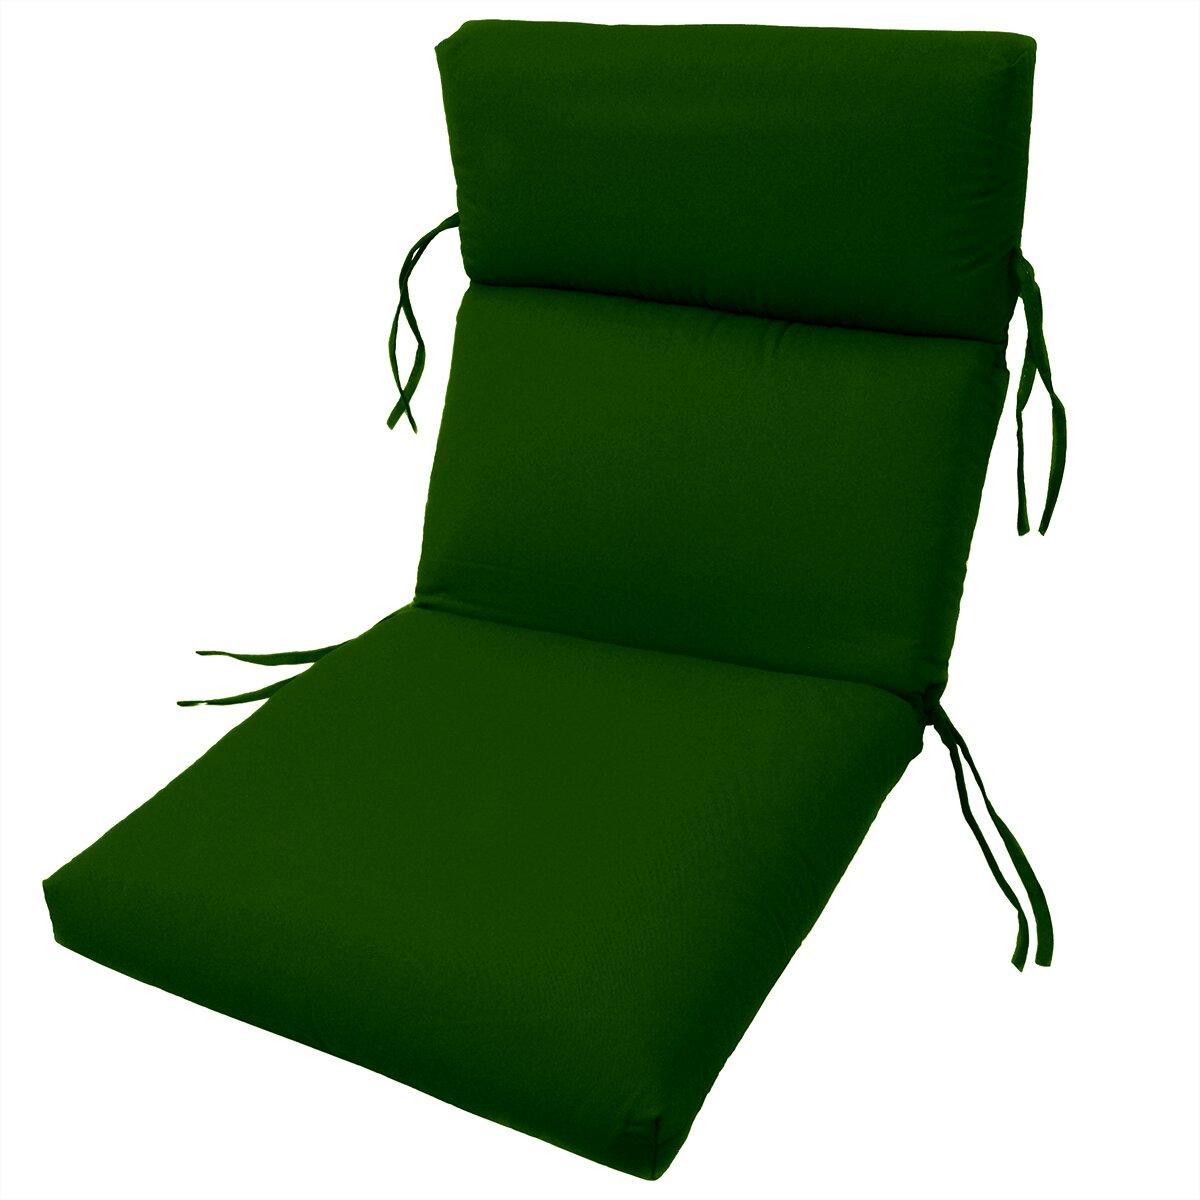 Patio lounge chair cushion - Comfort Classics Inc Lois Patio Lounge Chair Cushion